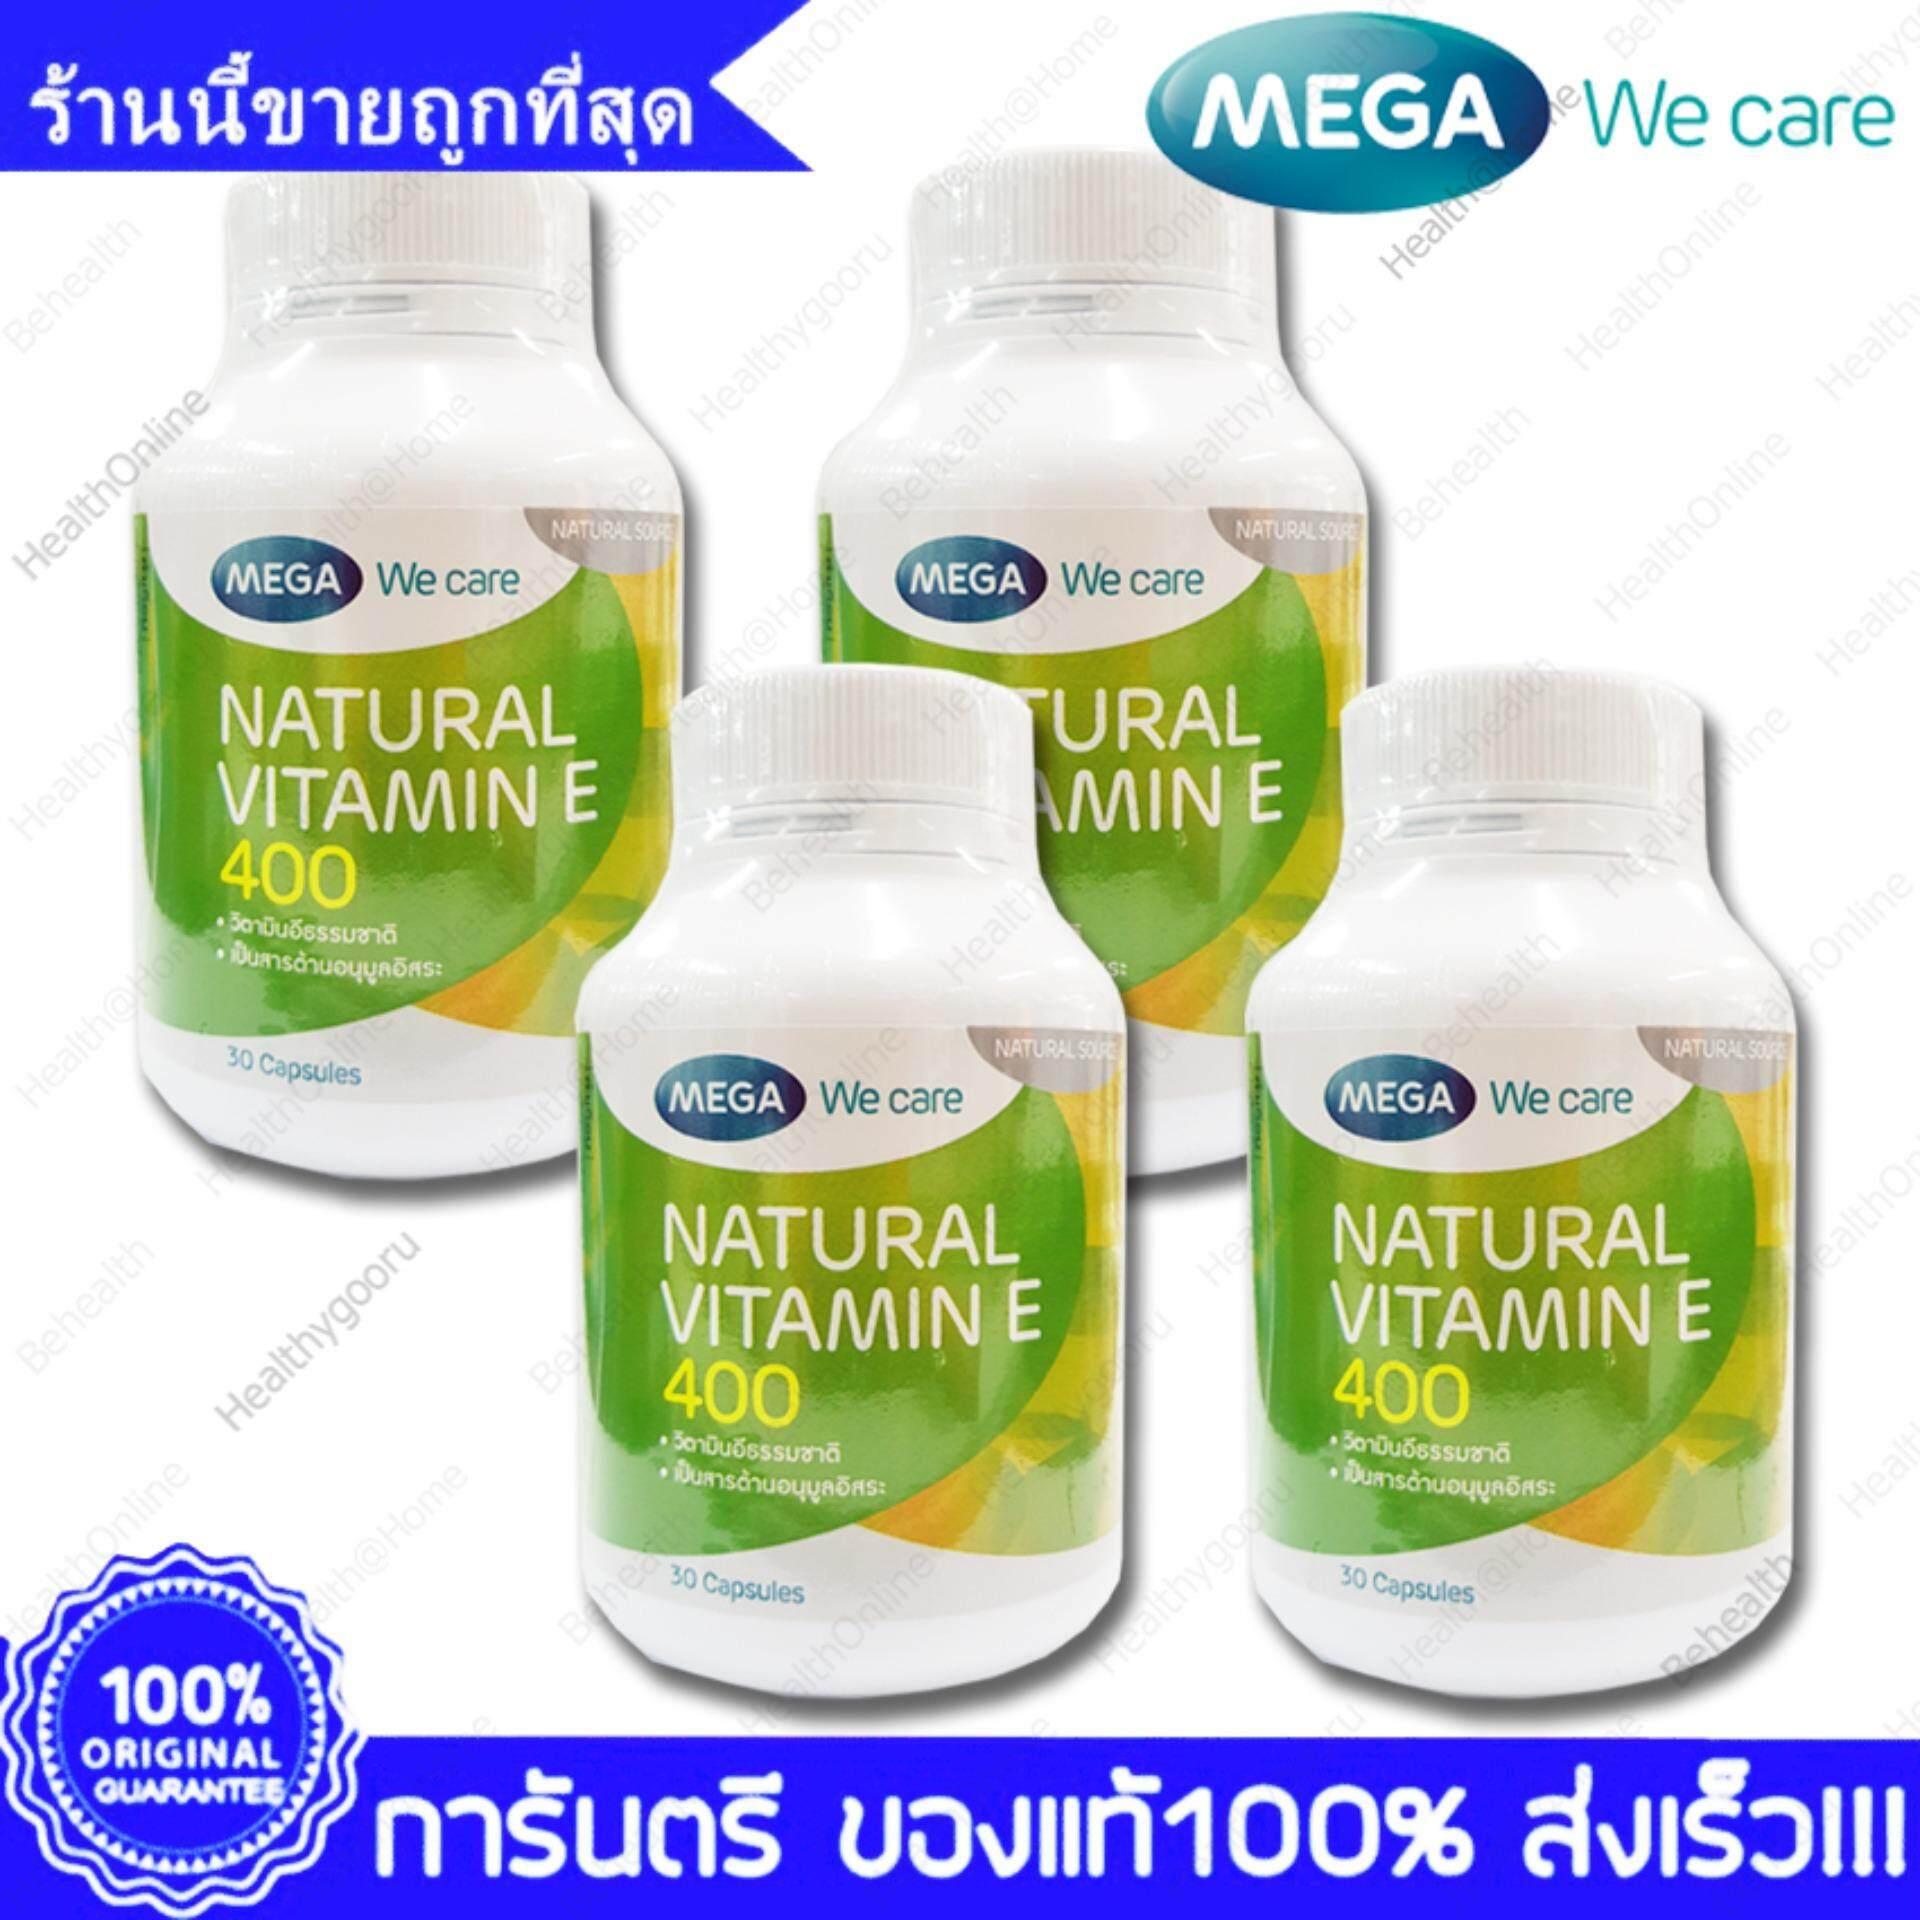 Mega We Care Natural Vitamin E 400 Iu Nat E ยูนิตสากล เมก้า วิตามิน อี ธรรมชาติ ลดริ้วรอย 30 แคปซูล(capsules) X 4 ขวด(bottles).